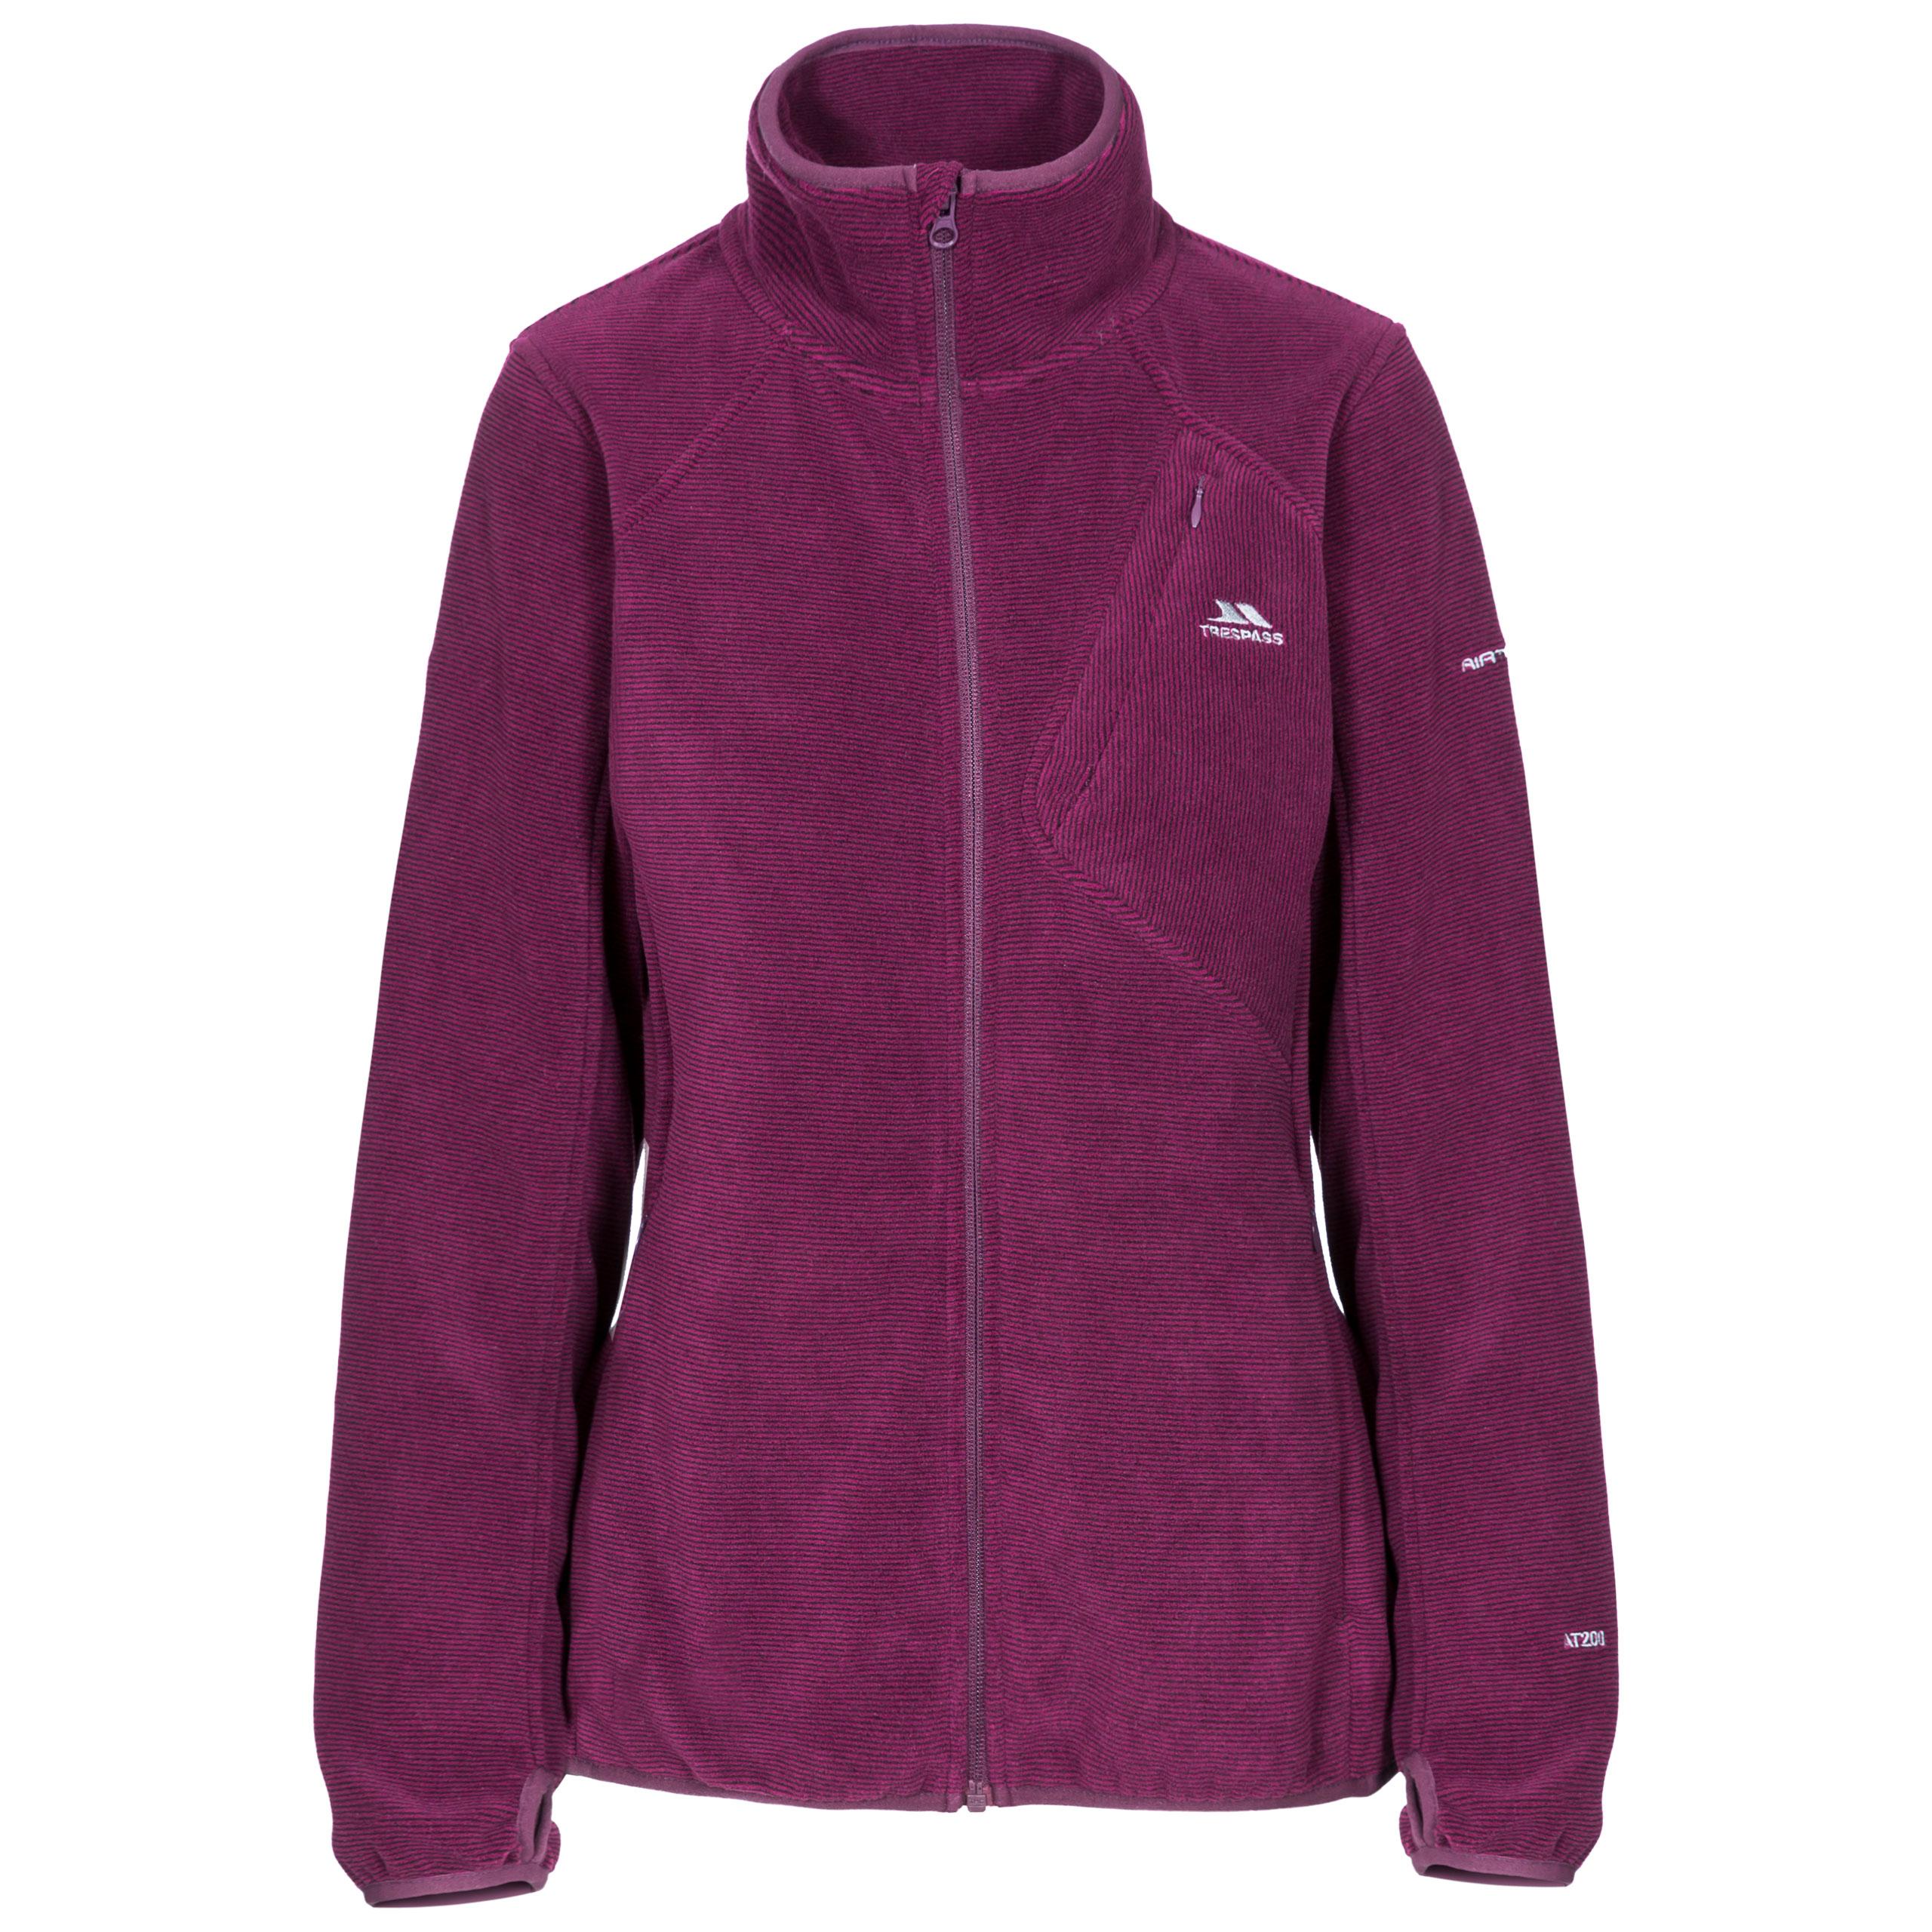 Trespass-Ciaran-Womens-Fleece-Jacket-in-Green-Navy-amp-Purple thumbnail 13